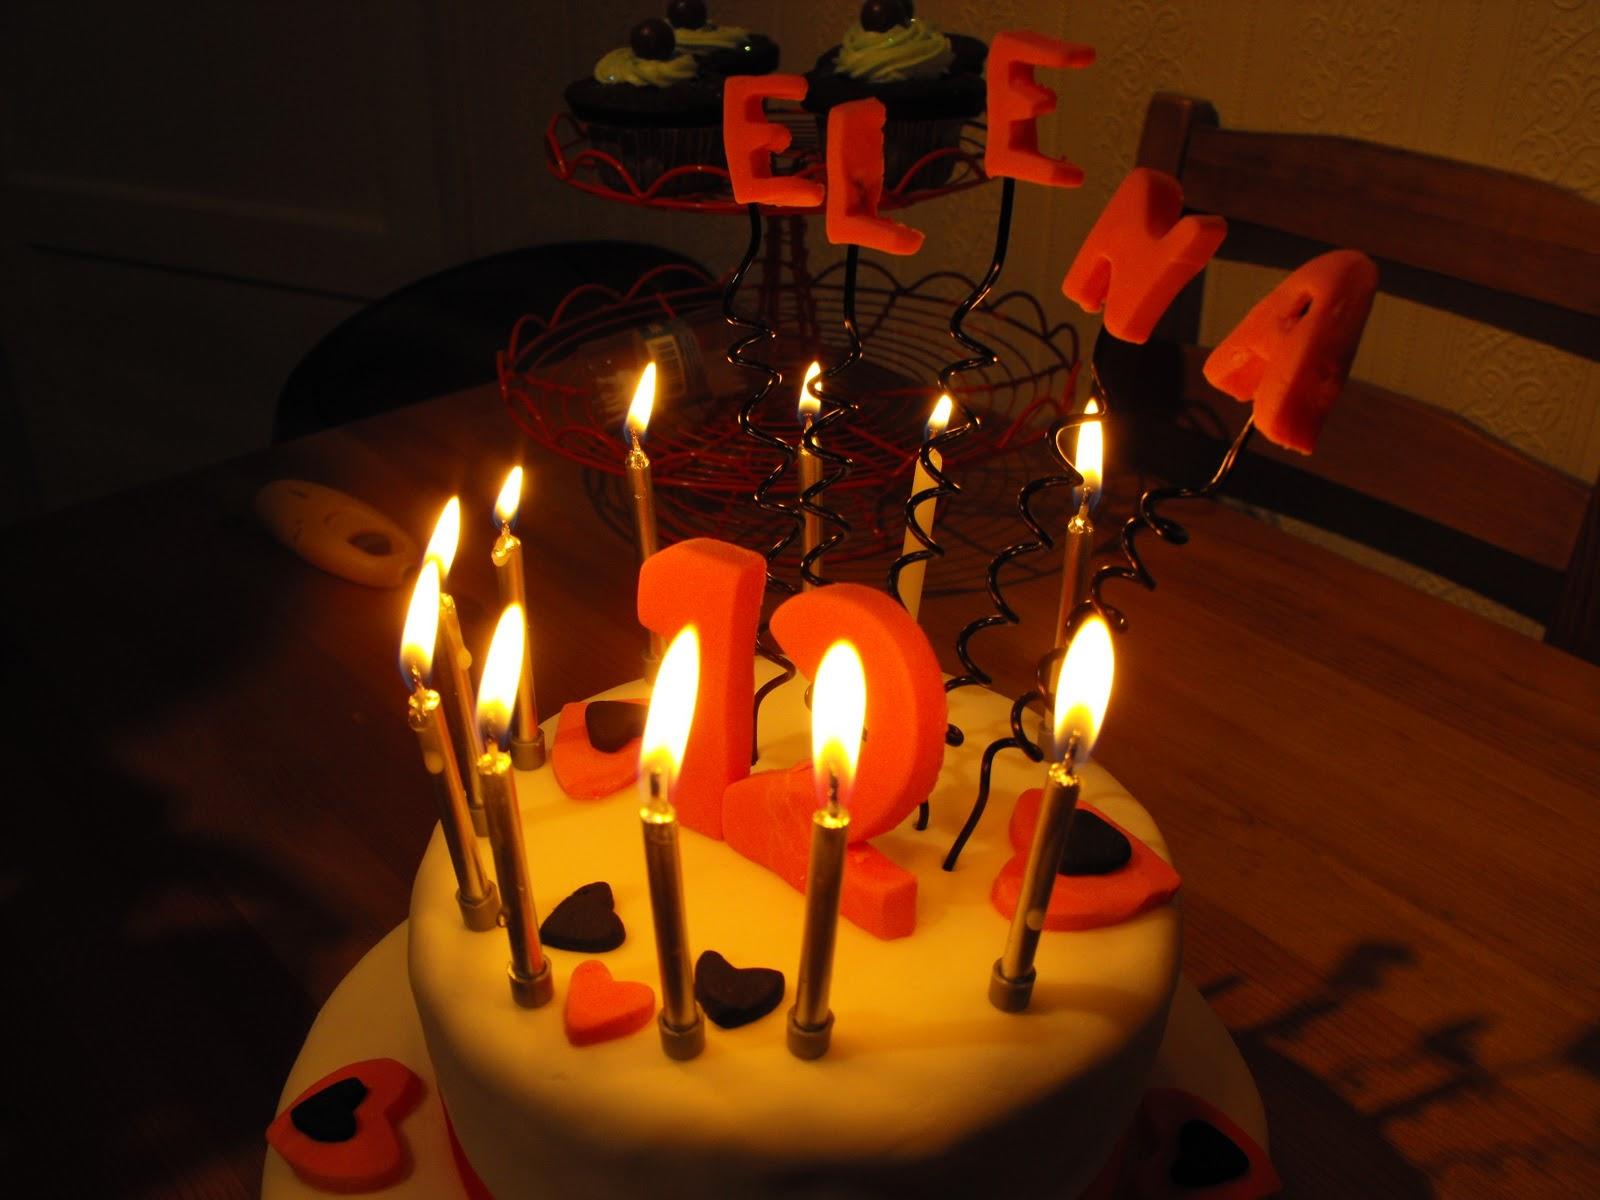 ... Cake AKA Lorraine Pascale's Red Velvet Cake | Anna's Kitchen Table